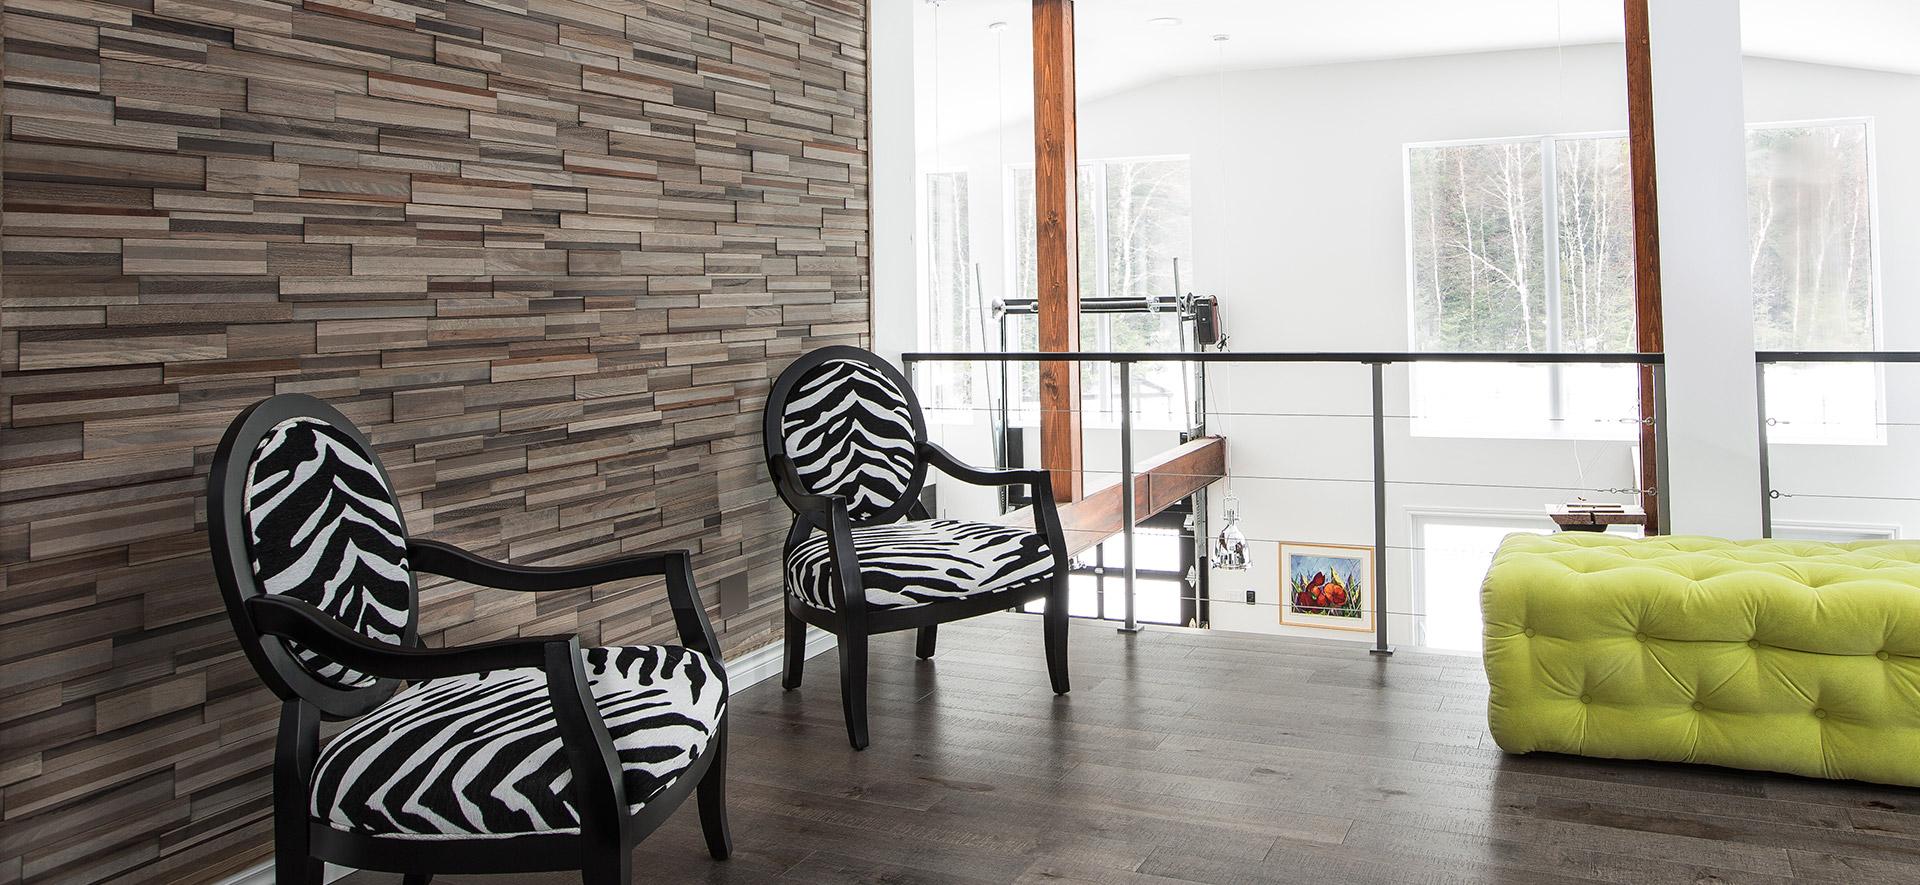 FIN - Finium -Hecolo SanFrancisco - Living spaces.jpg